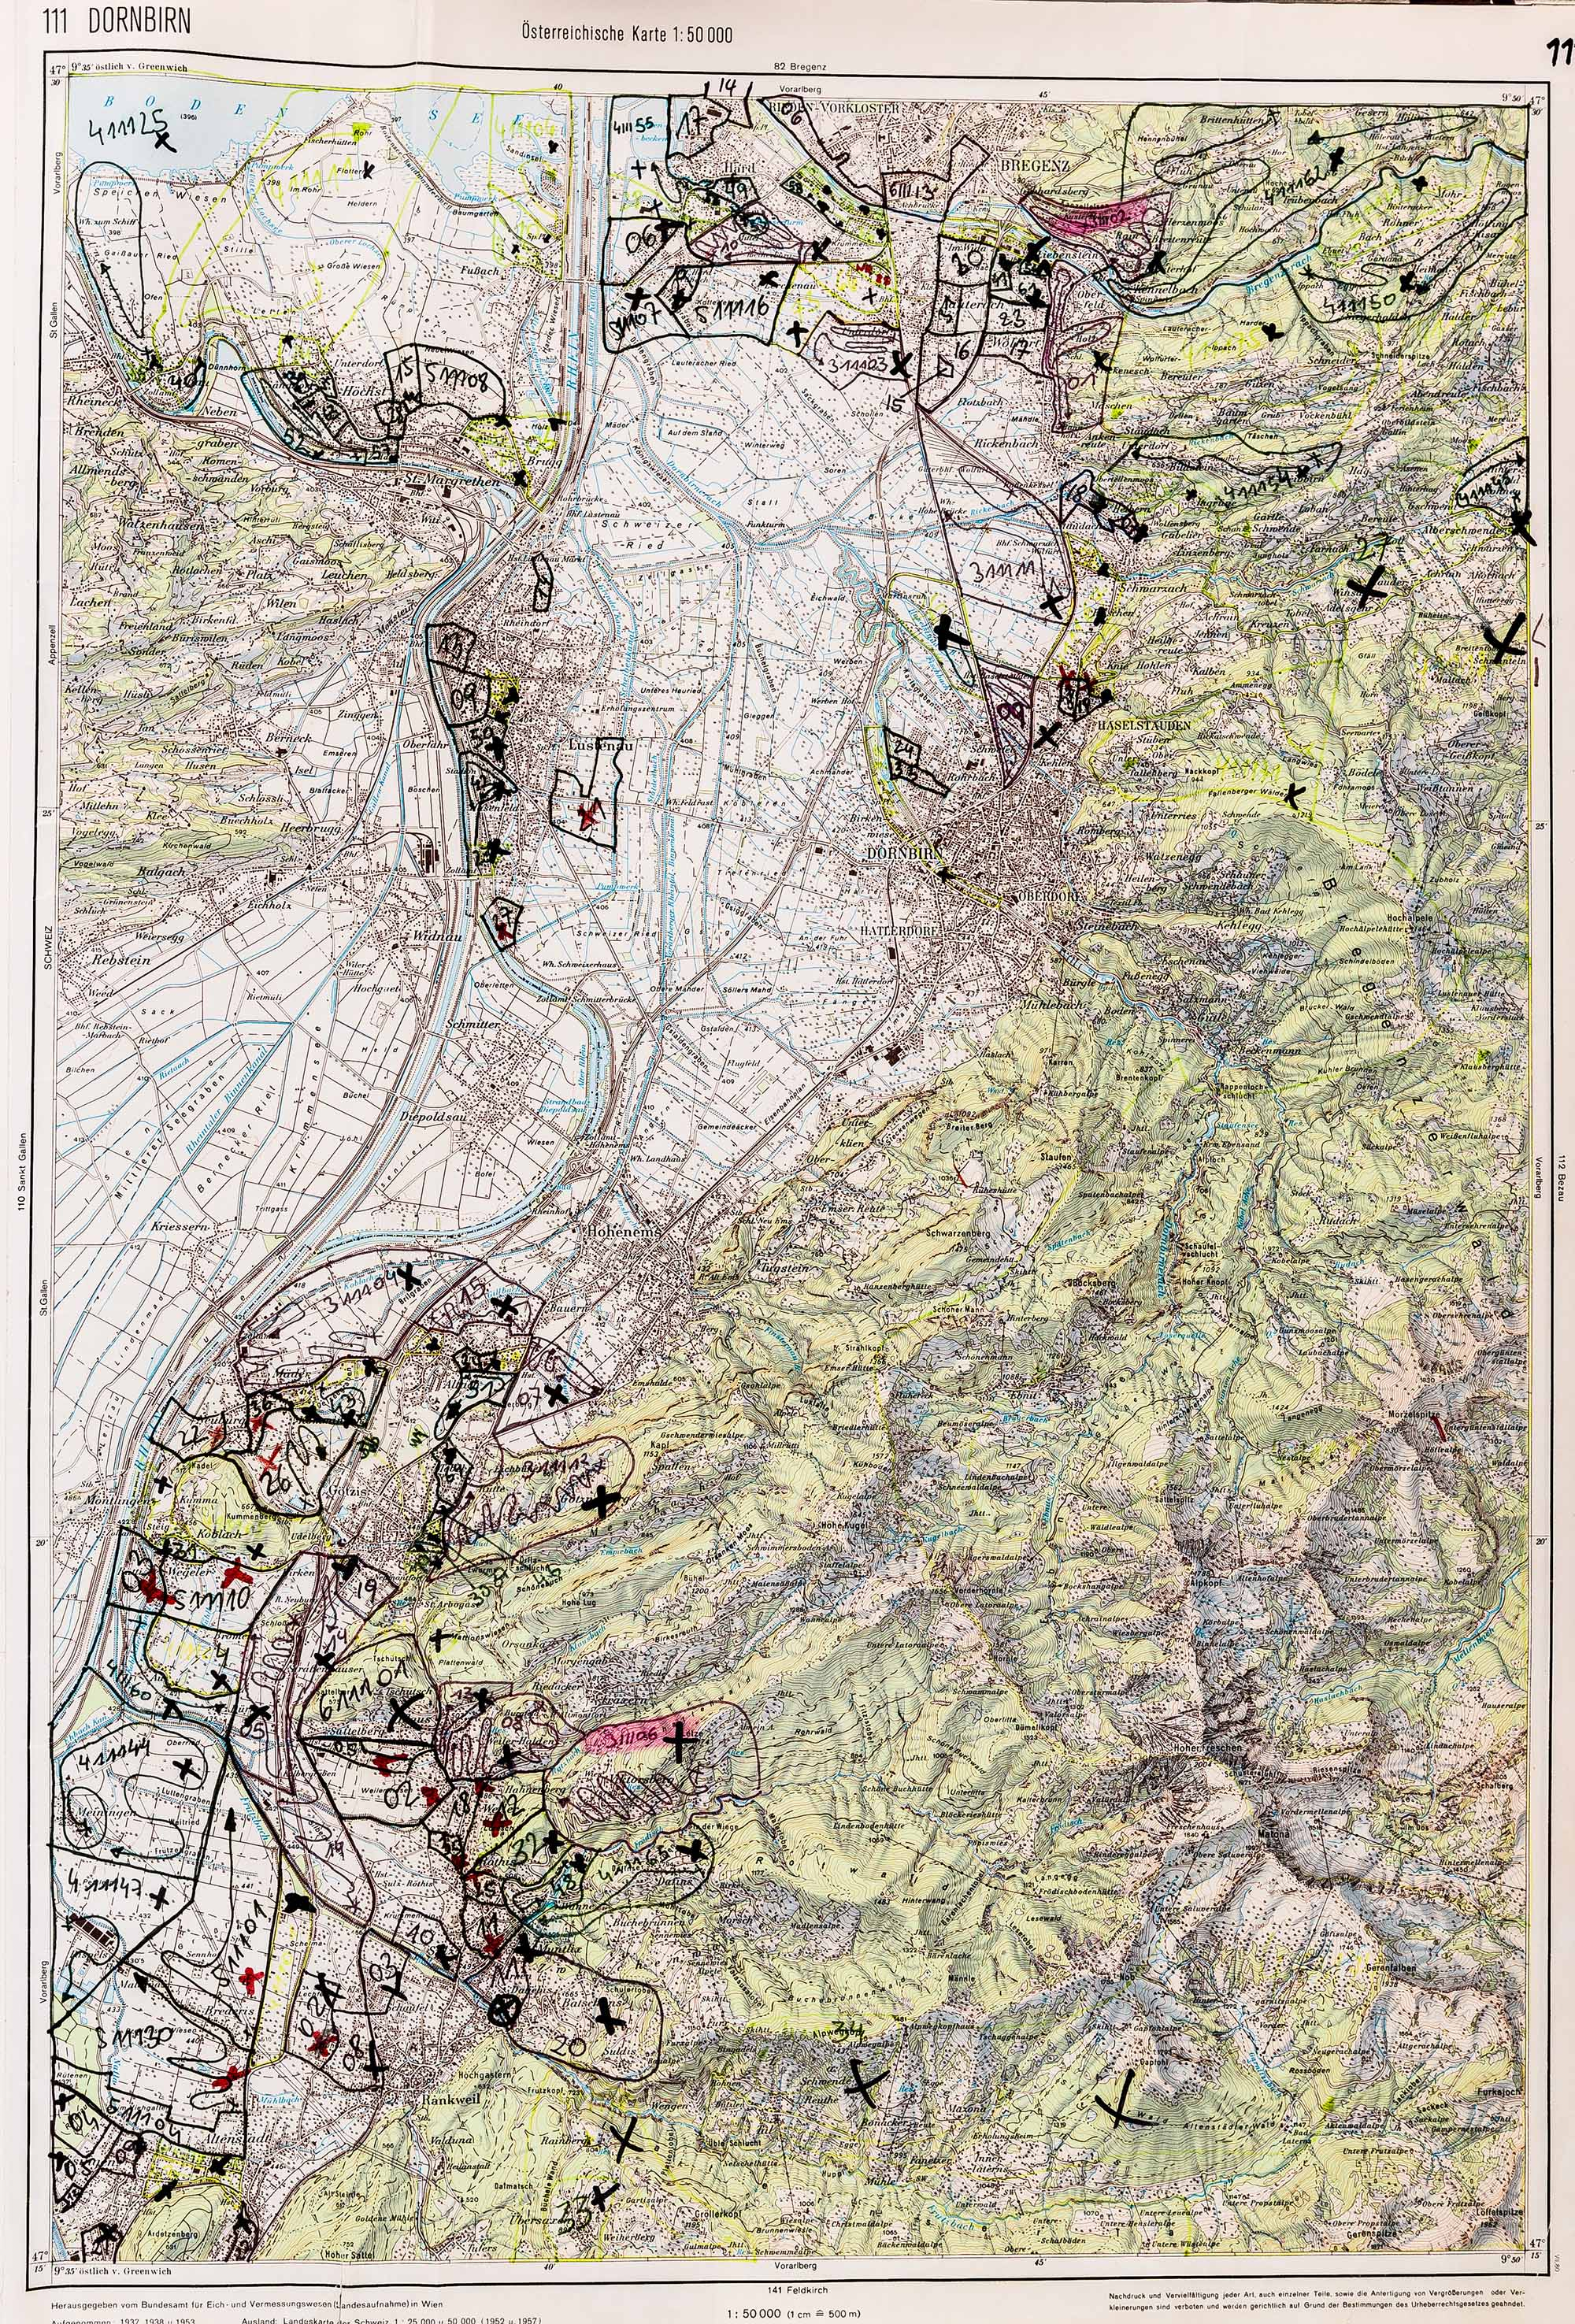 1983-1986 Karte 111